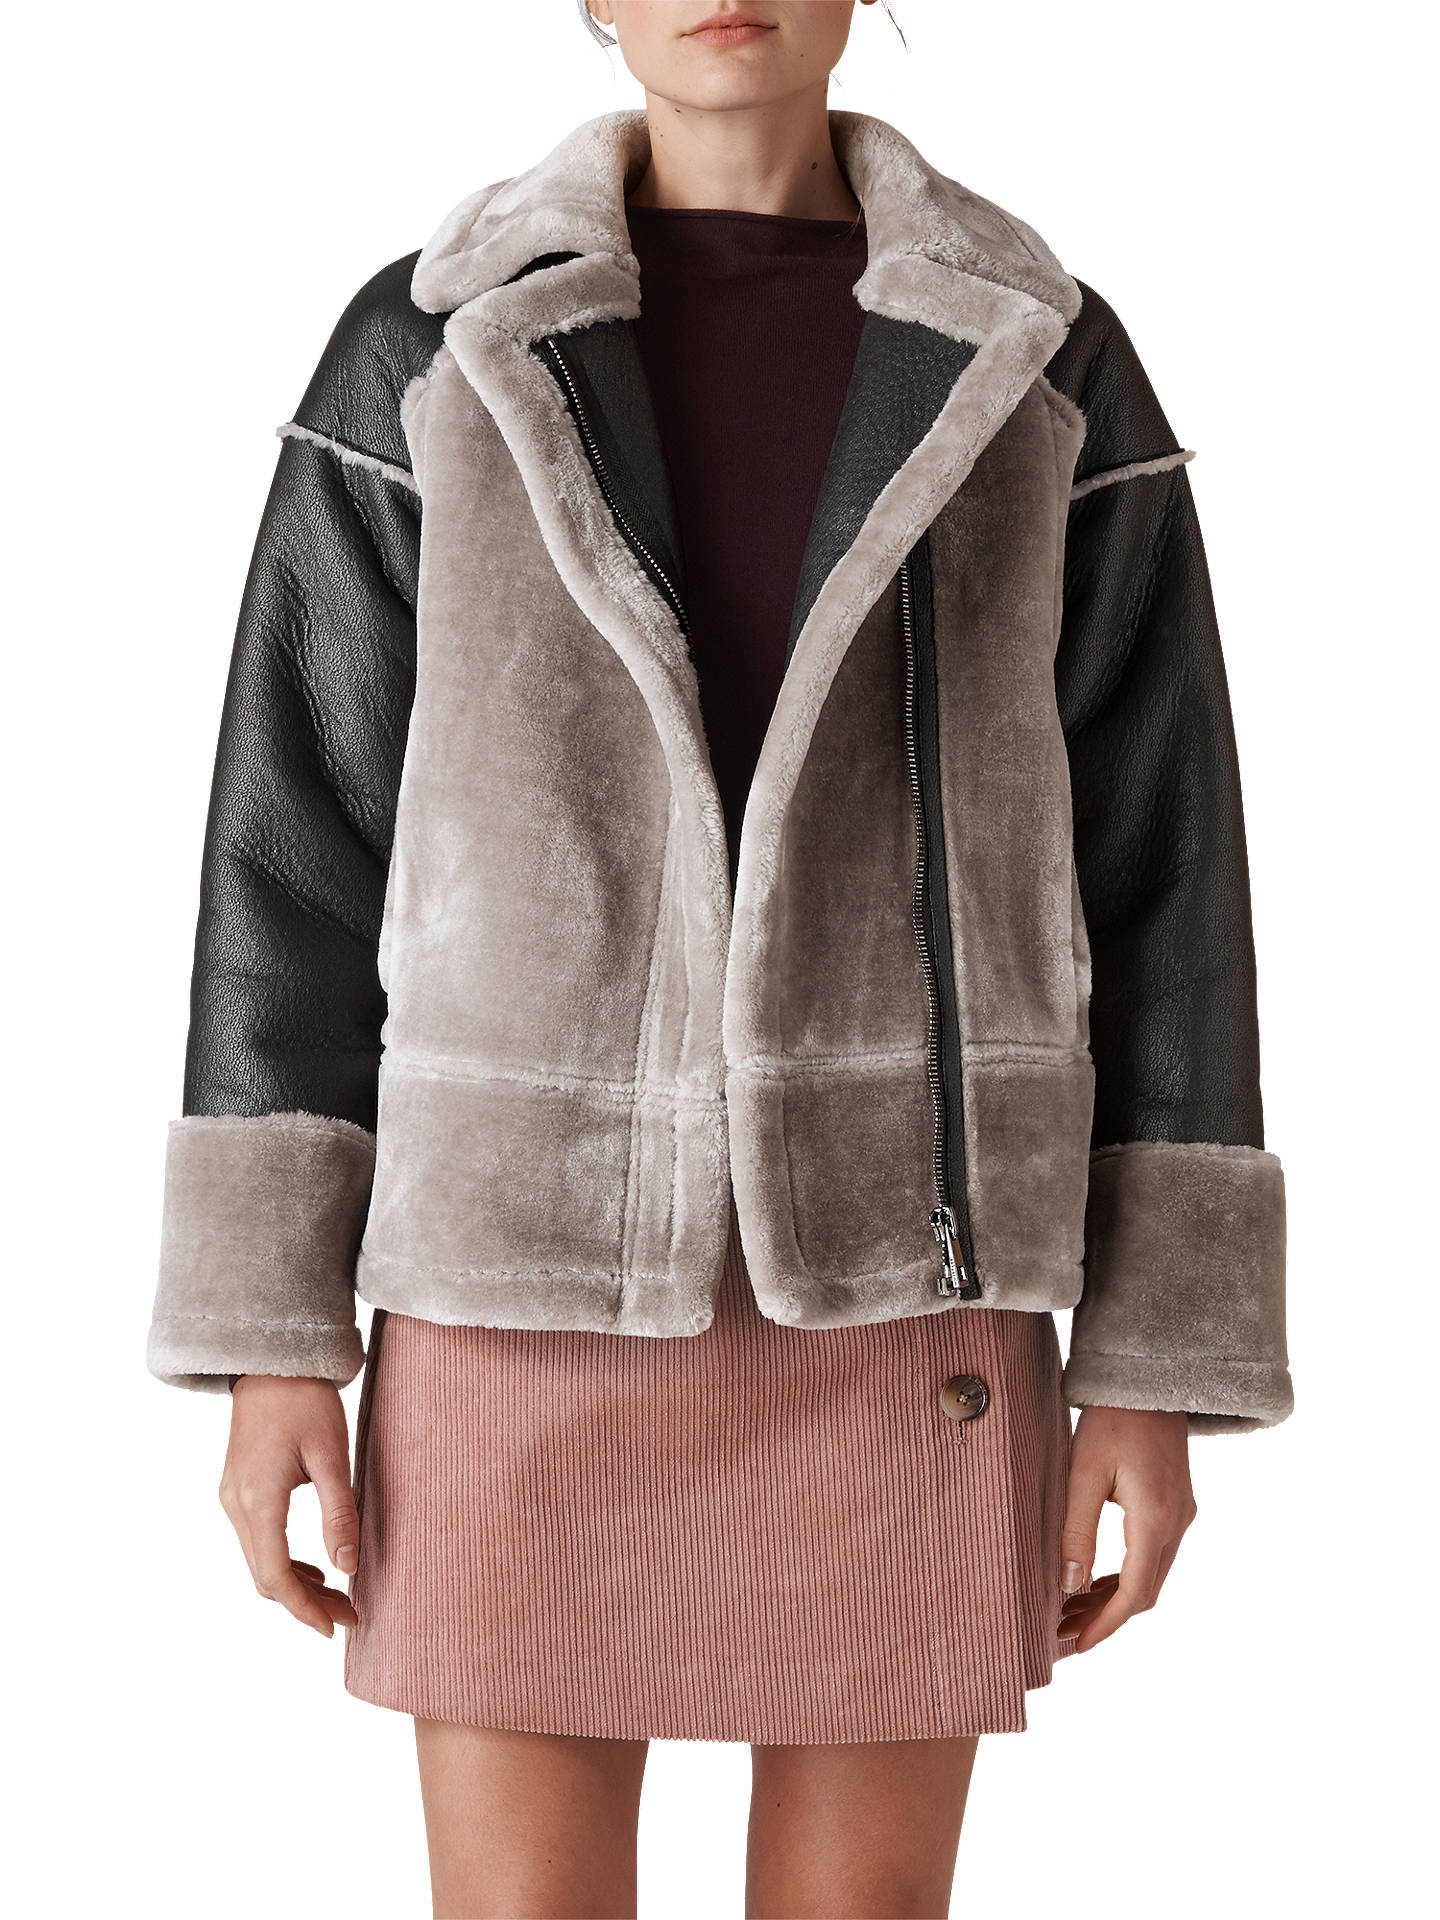 632ea3e64599 Buy Whistles Two Tone Faux Fur Biker Jacket